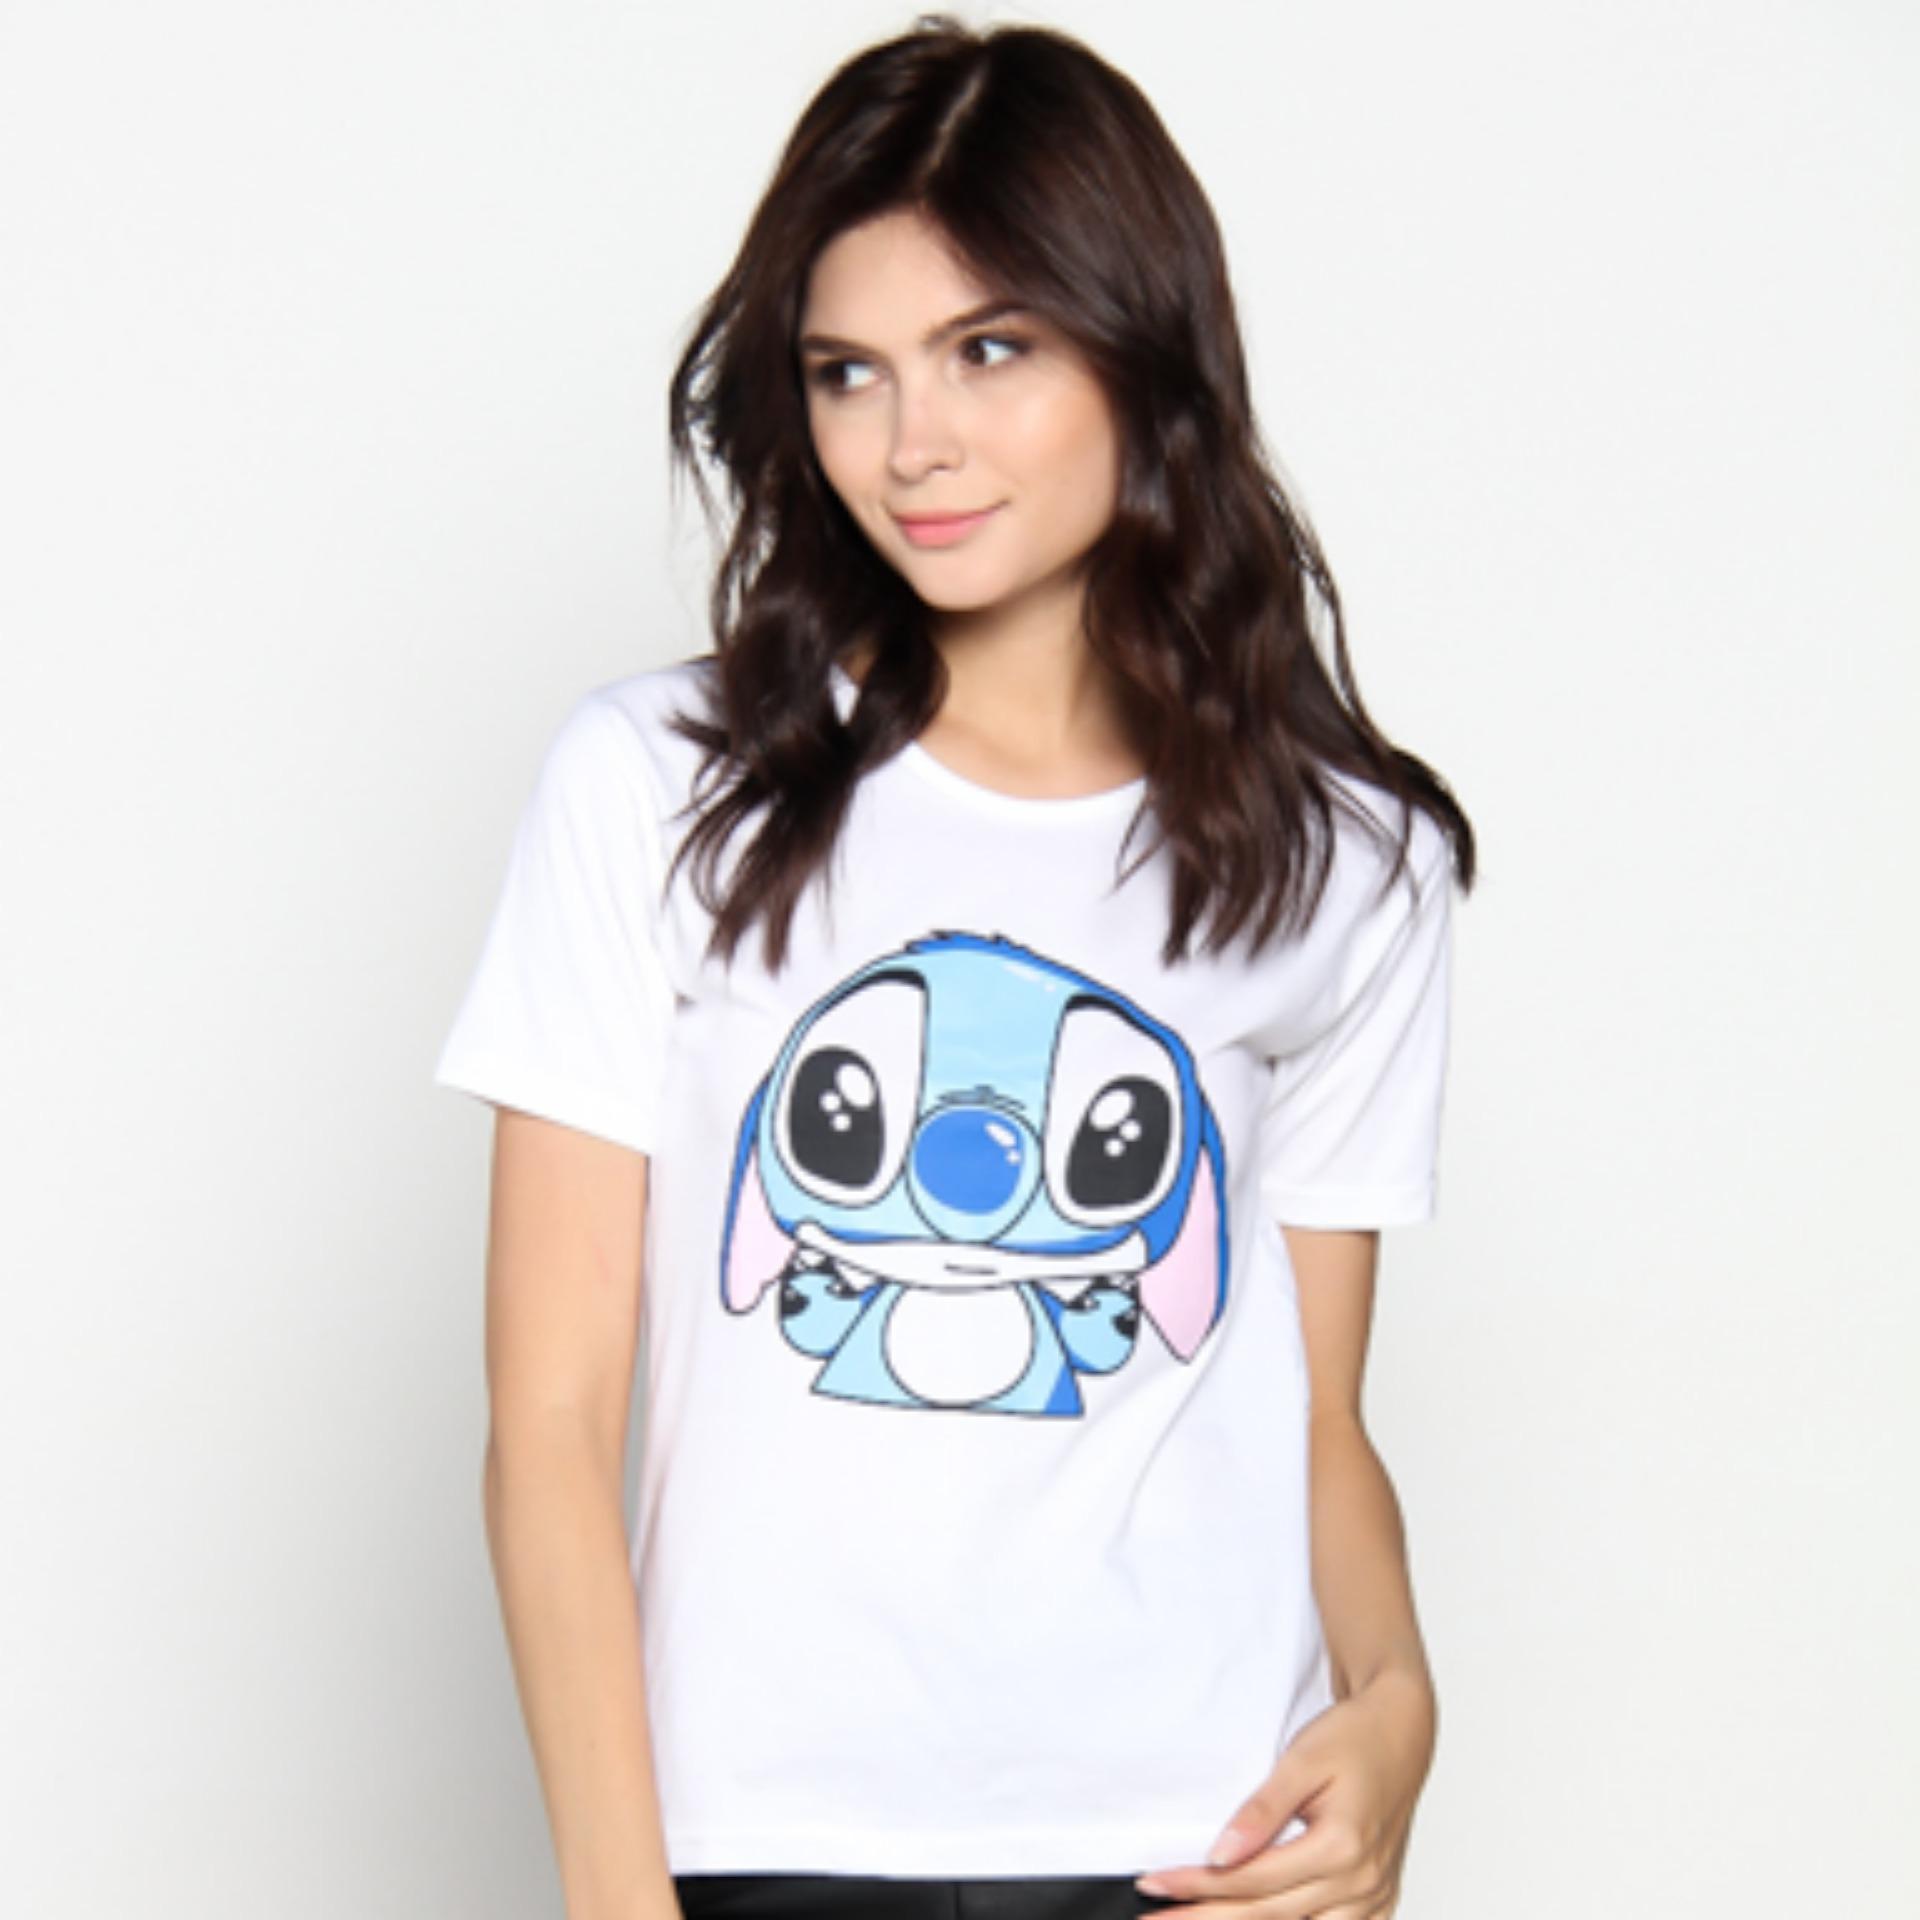 JCLOTHES - Tumblr Tee Tshirt Stitch Kaos Wanita